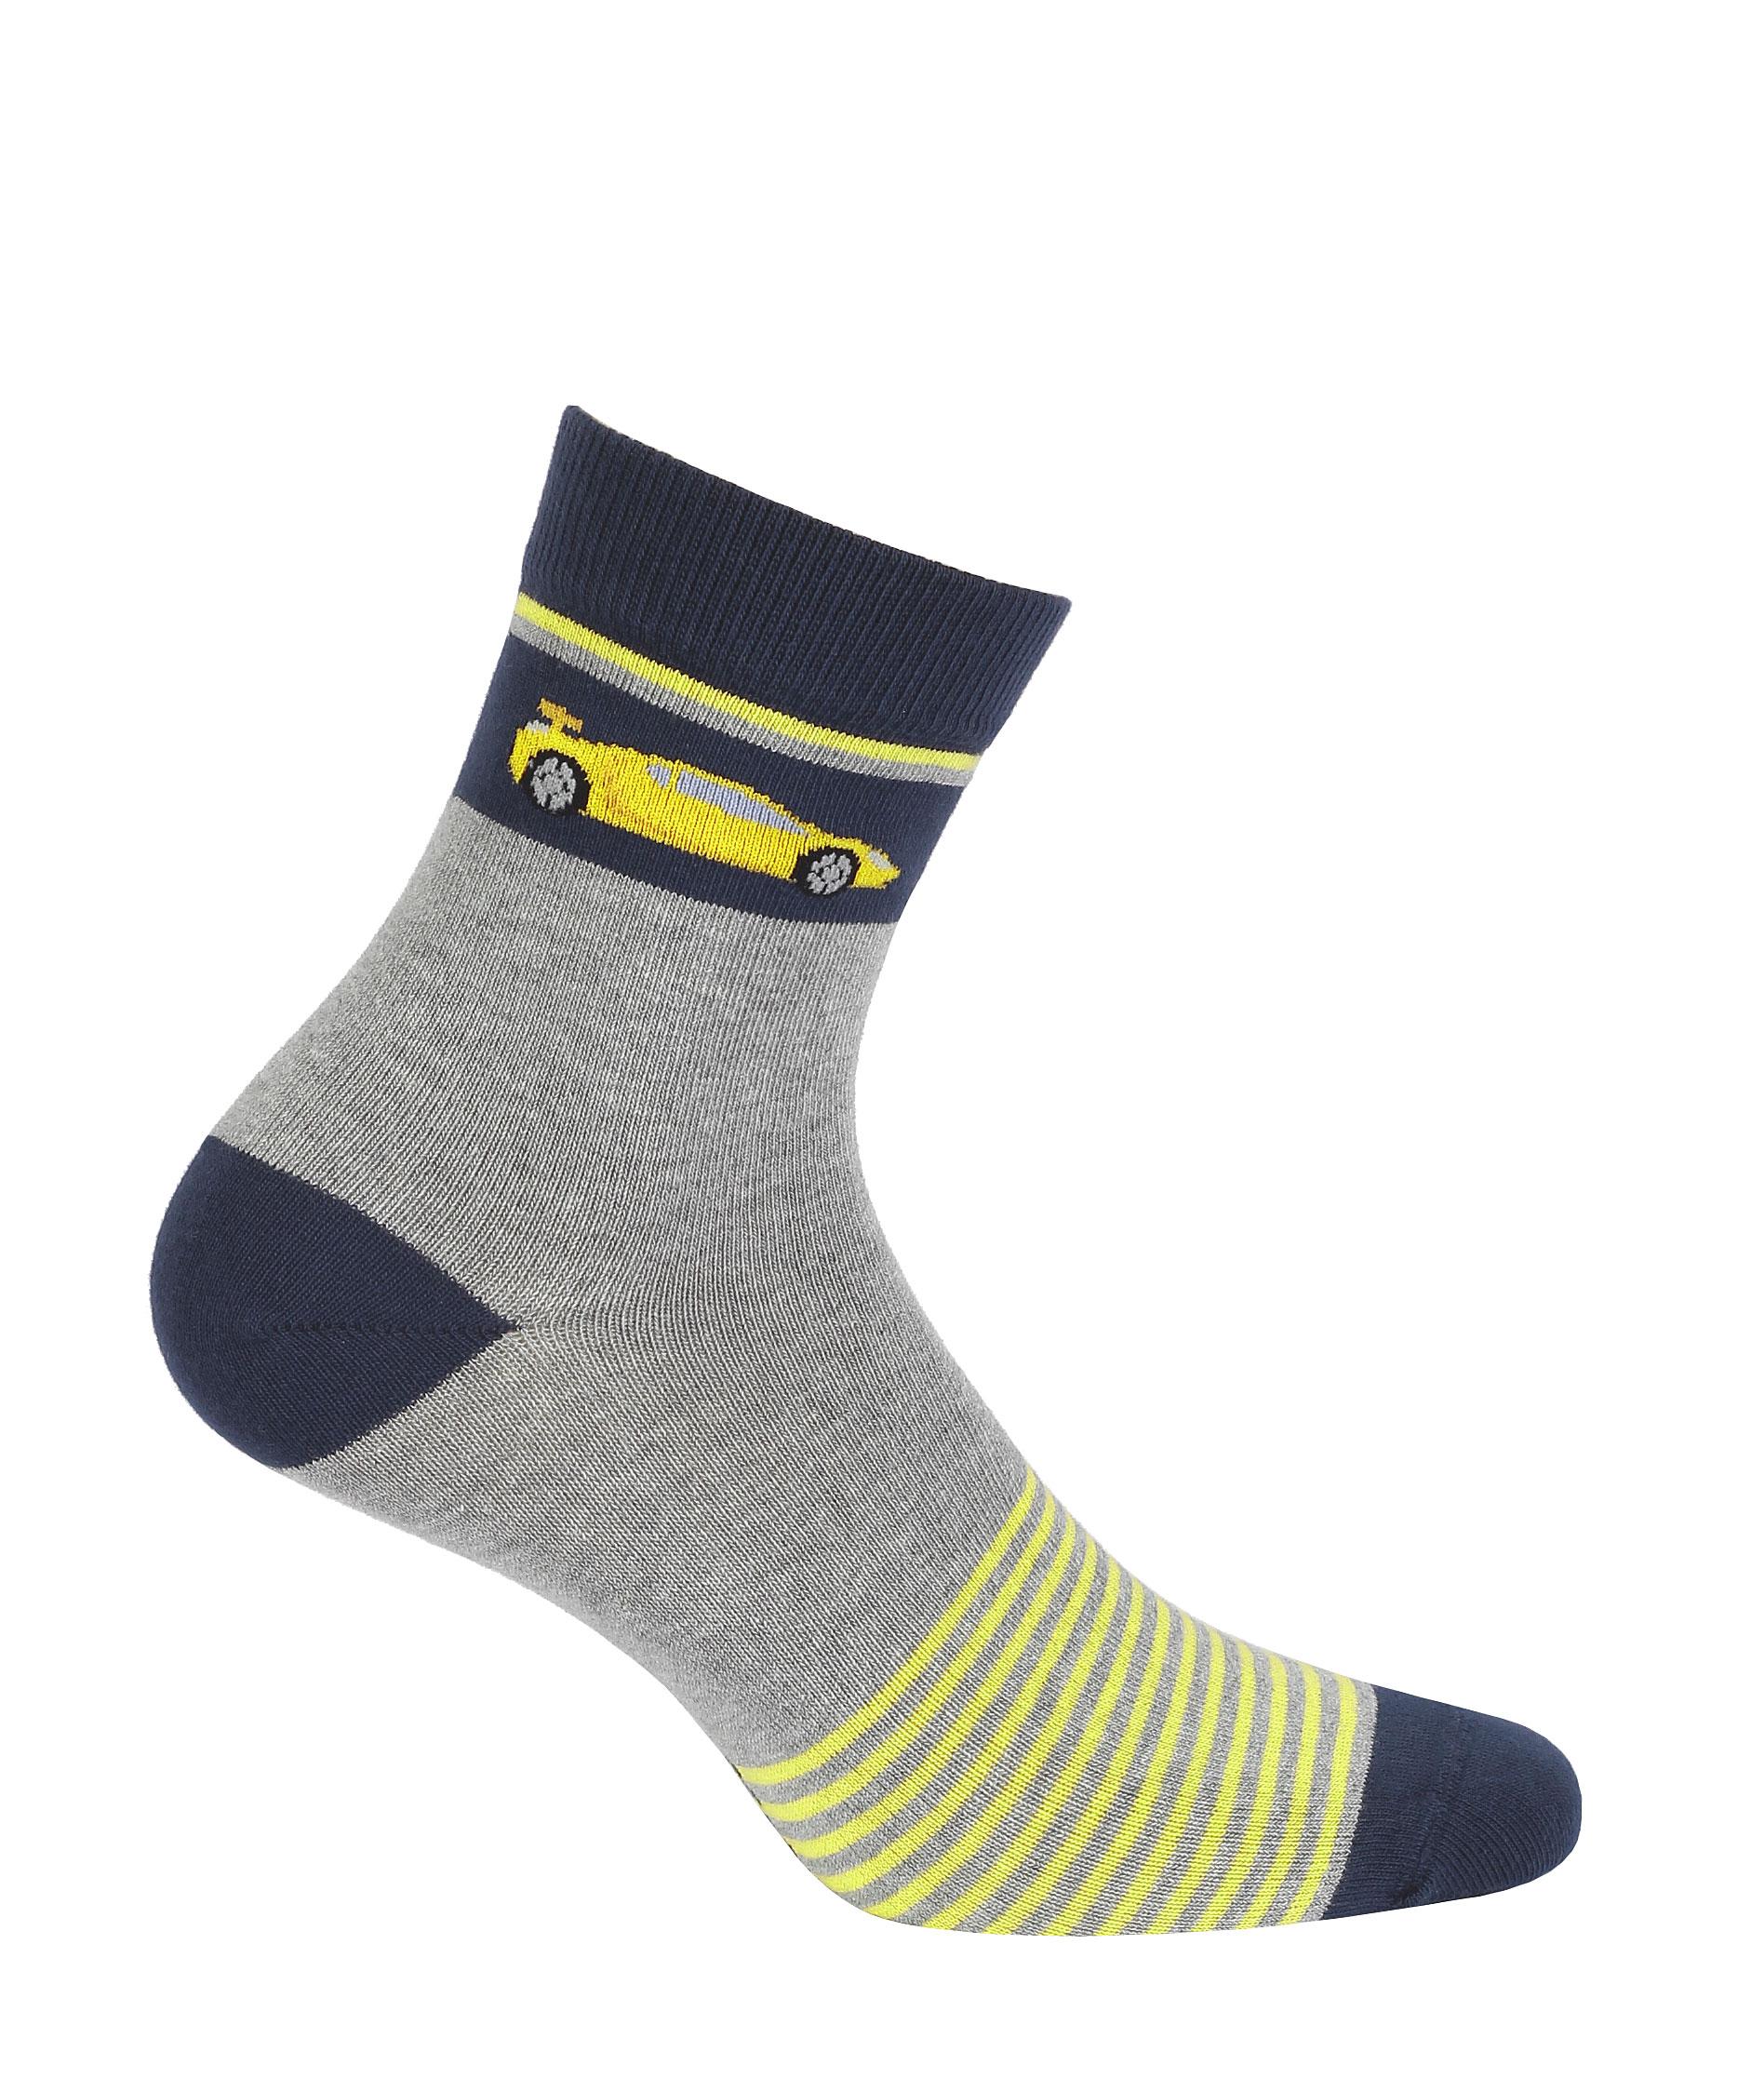 dětské ponožky vzor GATTA AUTO žluté proužky 36-38